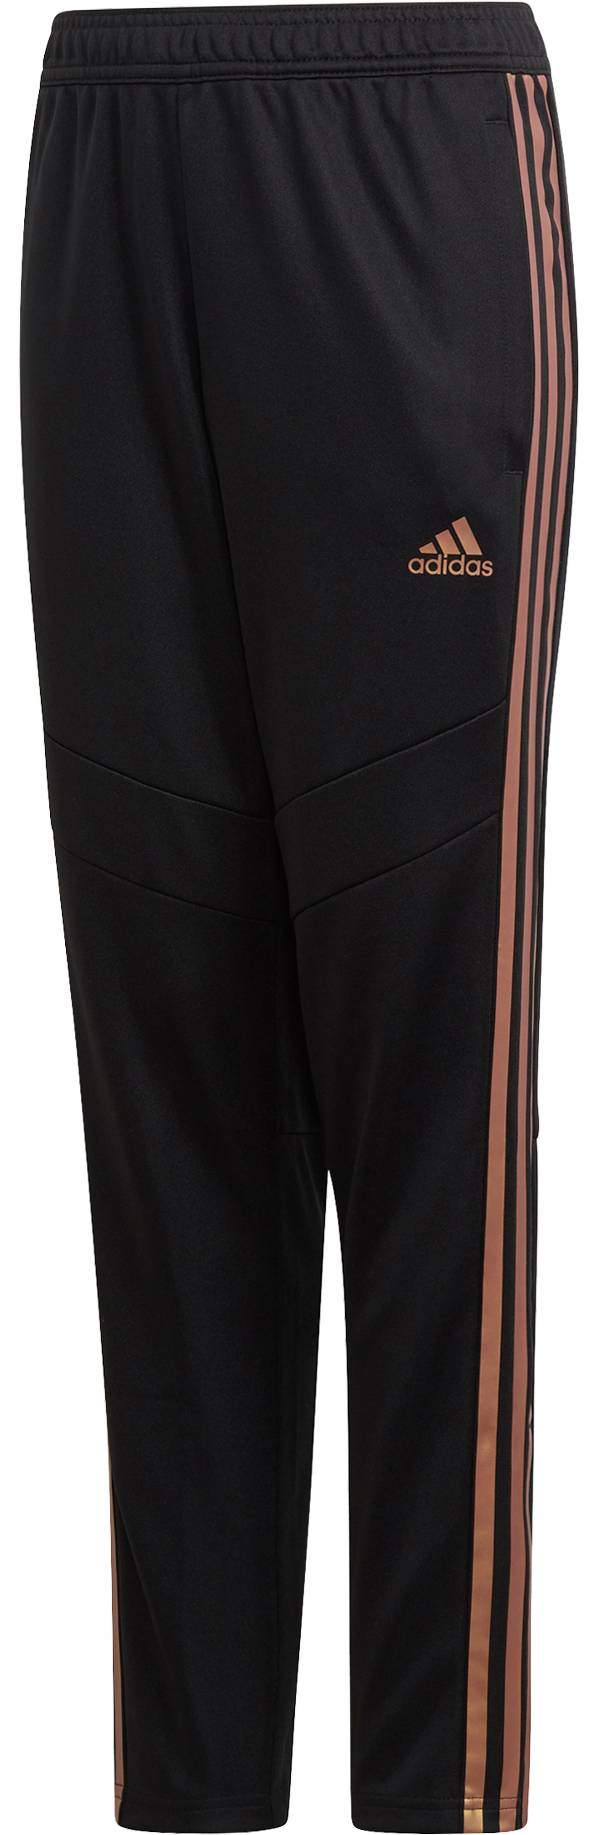 adidas Youth Metallic Tiro 19 Training Pants product image